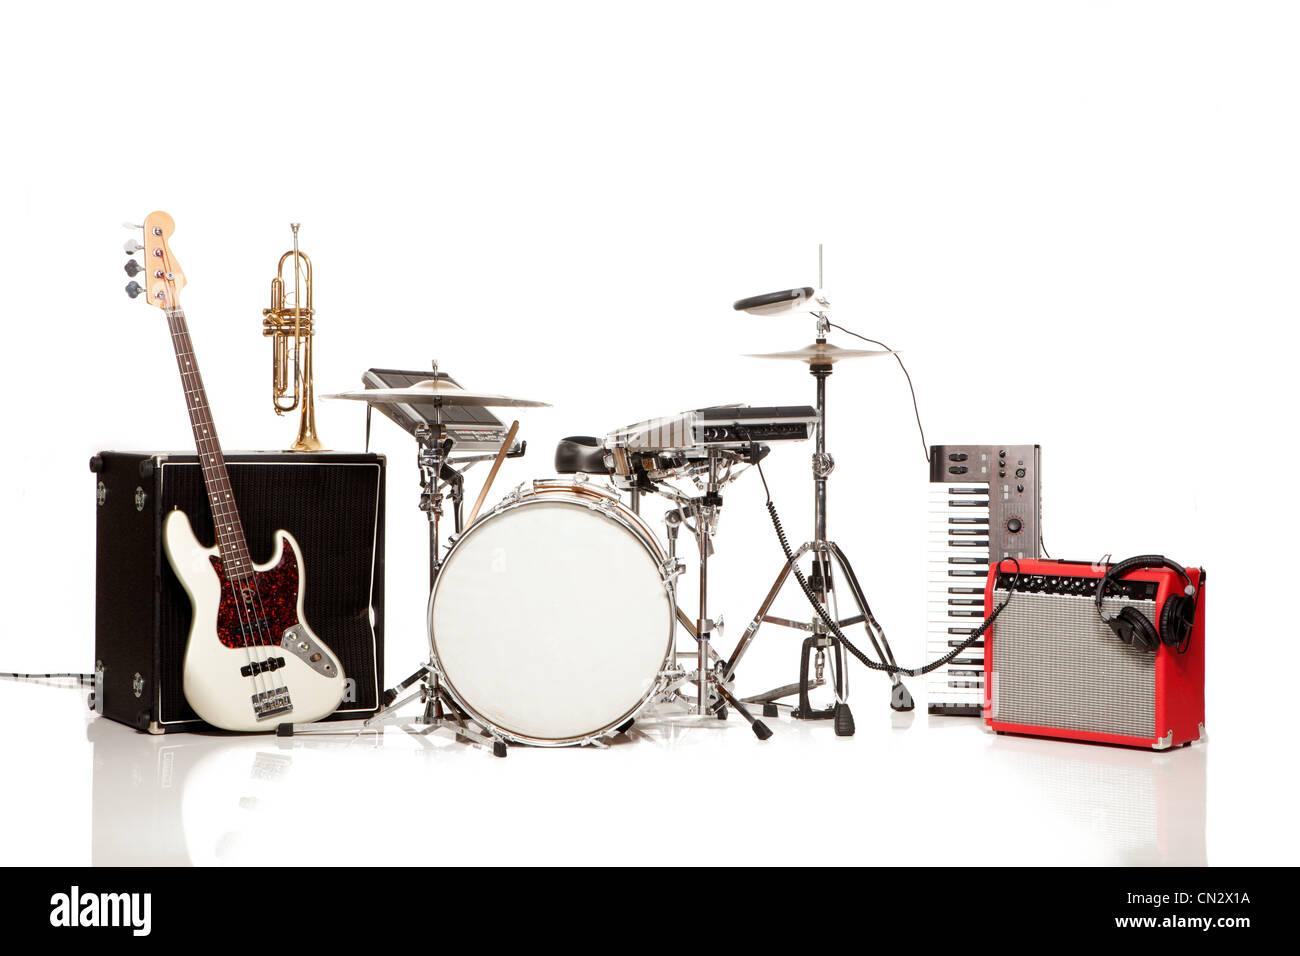 Drum kit, studio shot - Stock Image